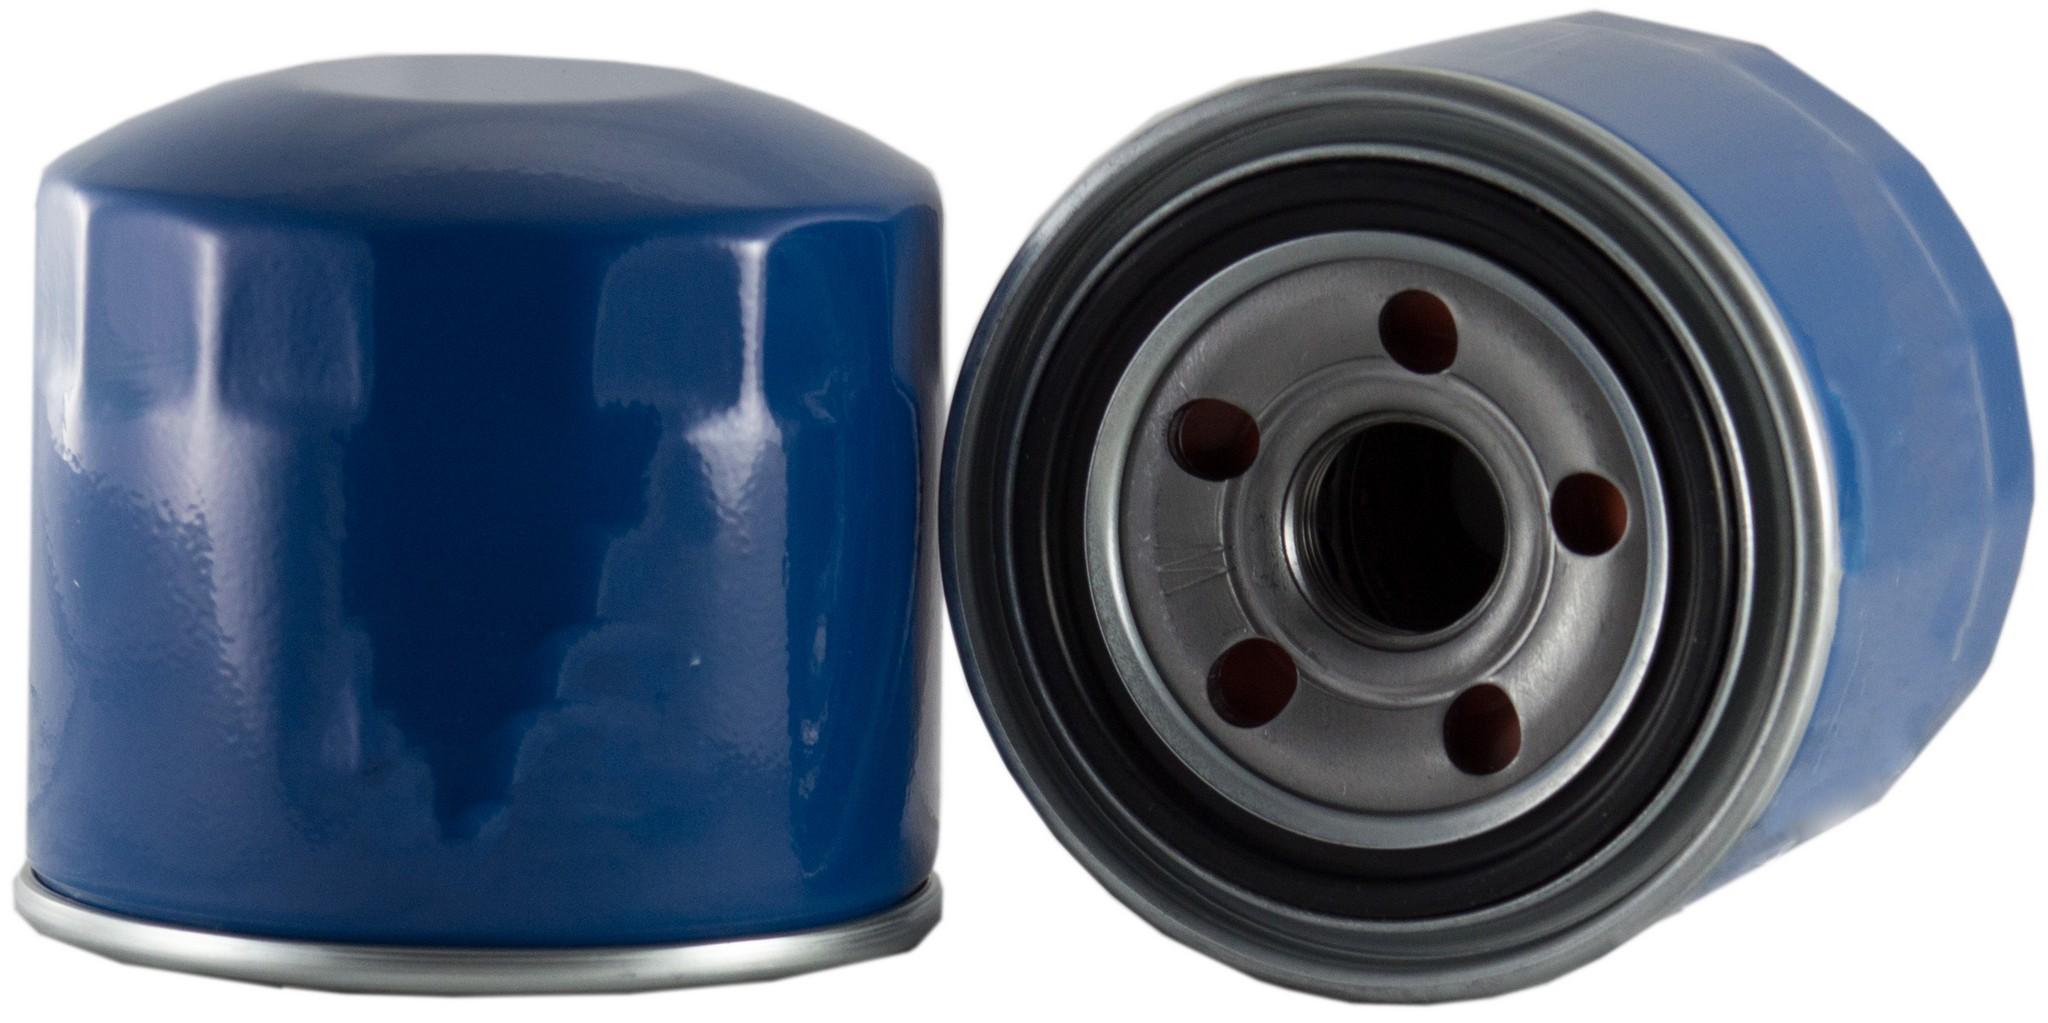 2008 Hyundai Sonata Engine Oil Filter   AutoPartsKart.com